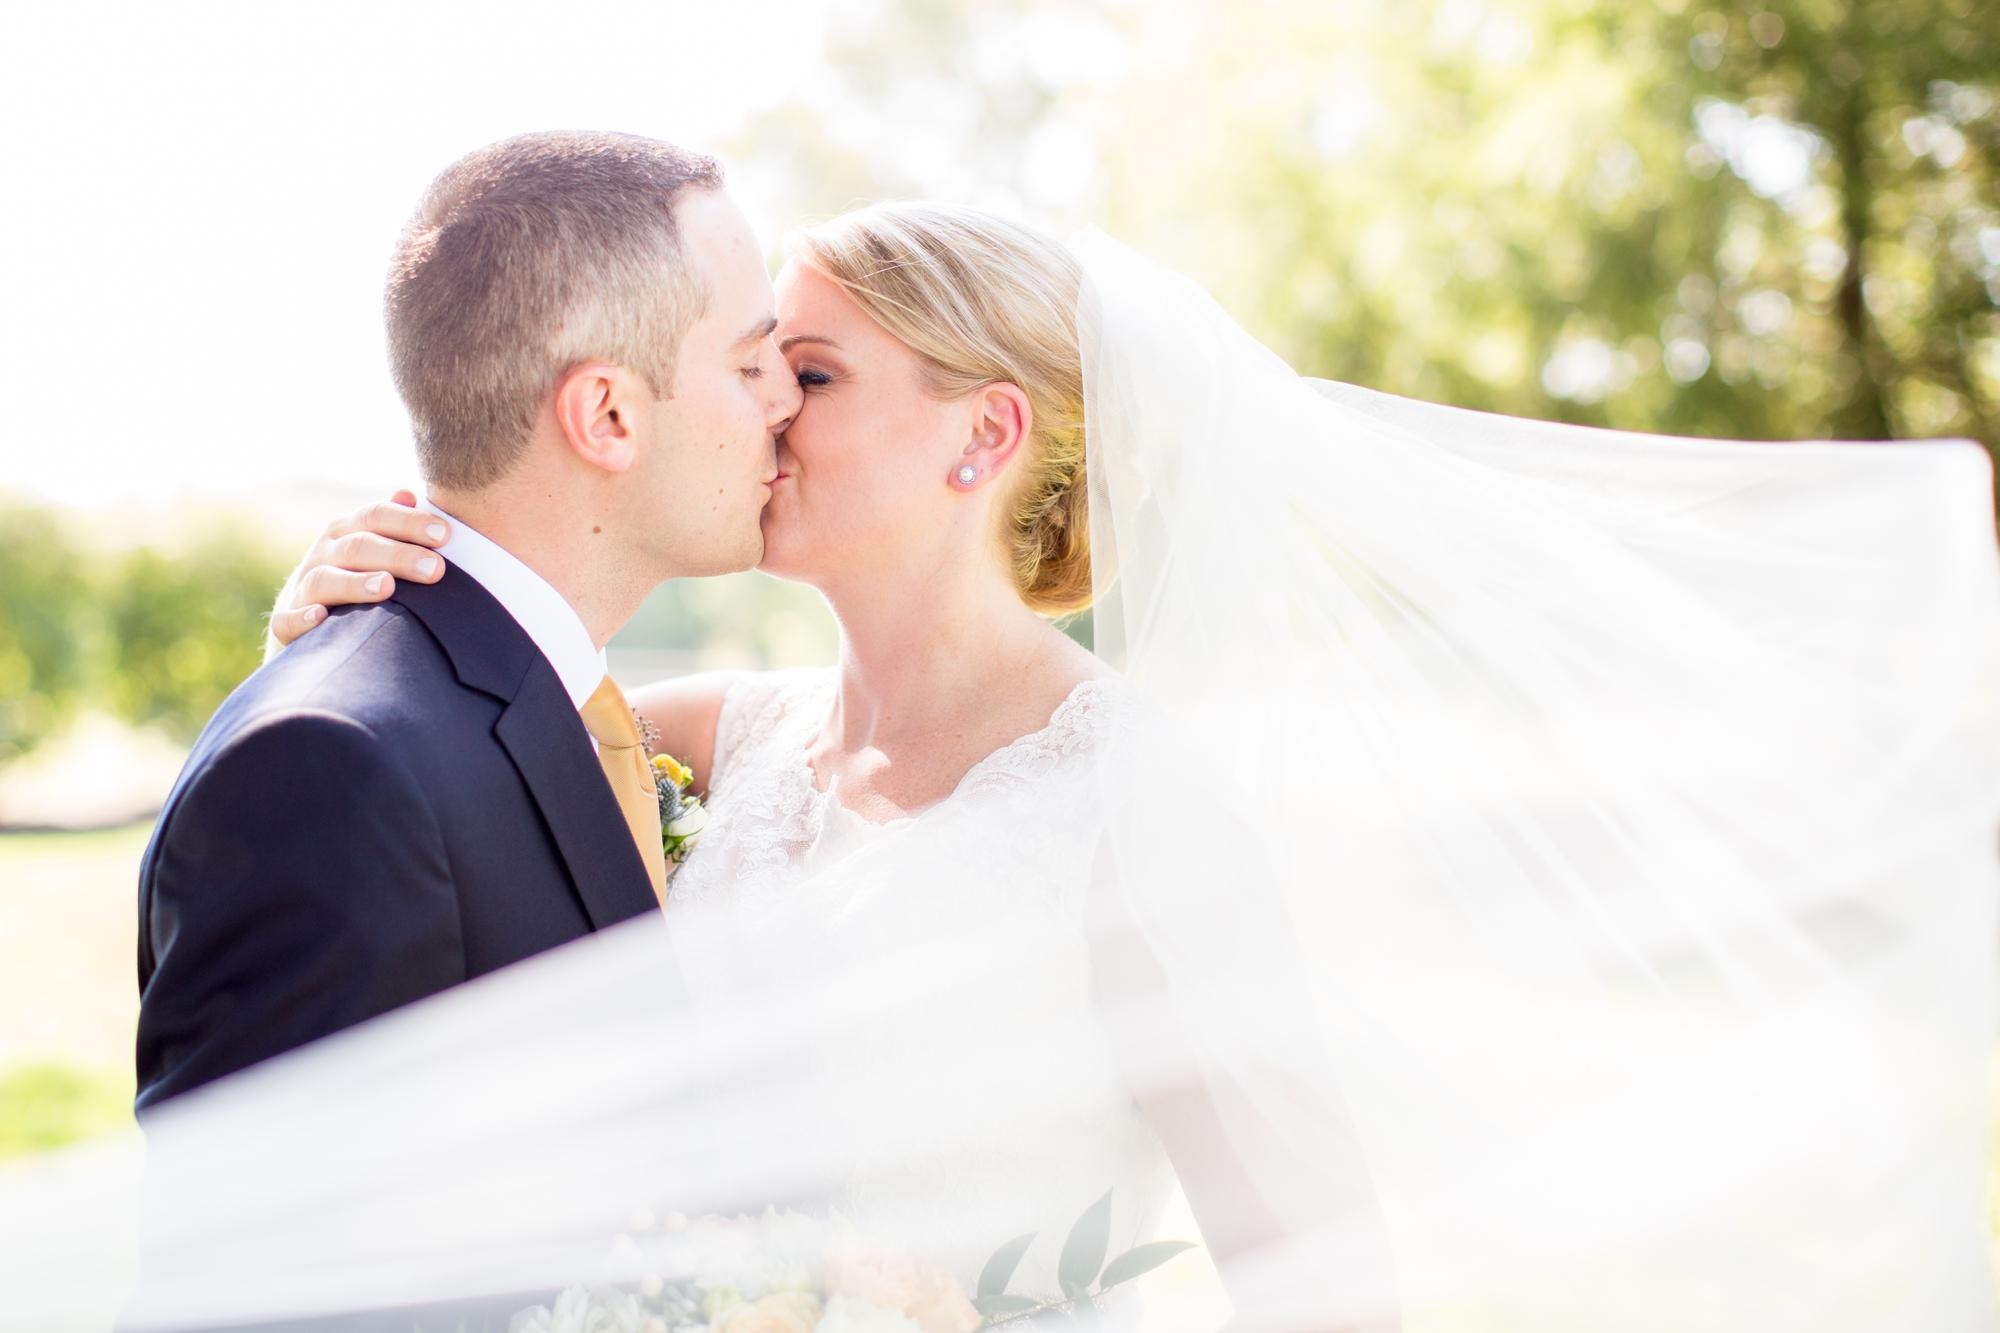 3-Miano Wedding Bride & Groom Portraits-283_anna grace photography maryland wedding photographer rockland estates.jpg